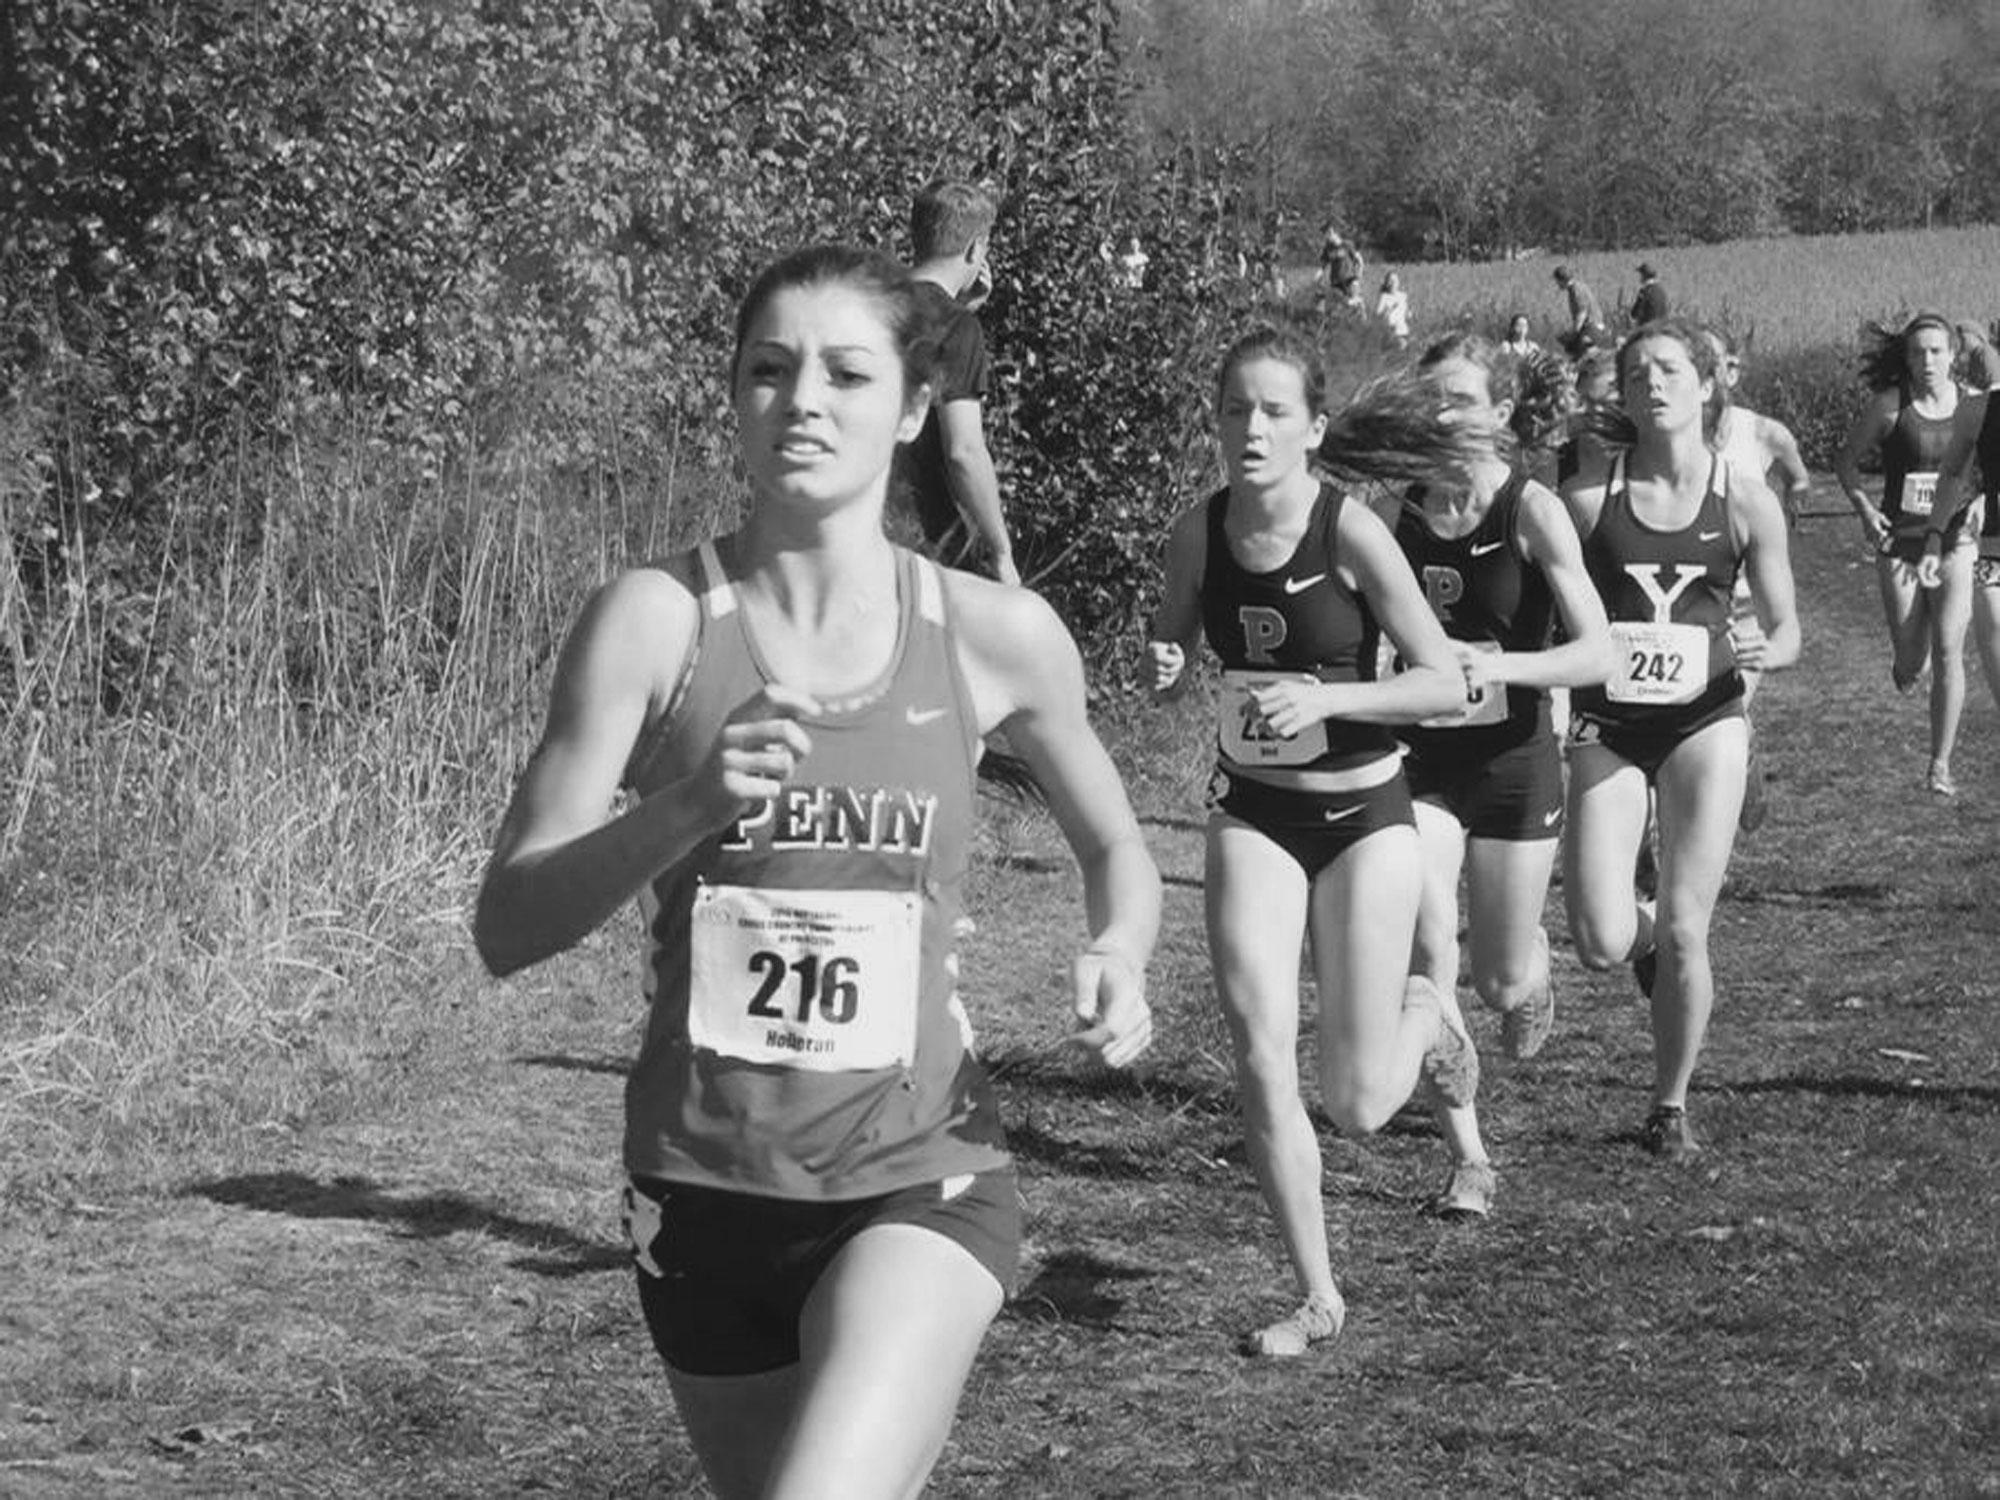 Madison Holleran running a cross country race at Penn